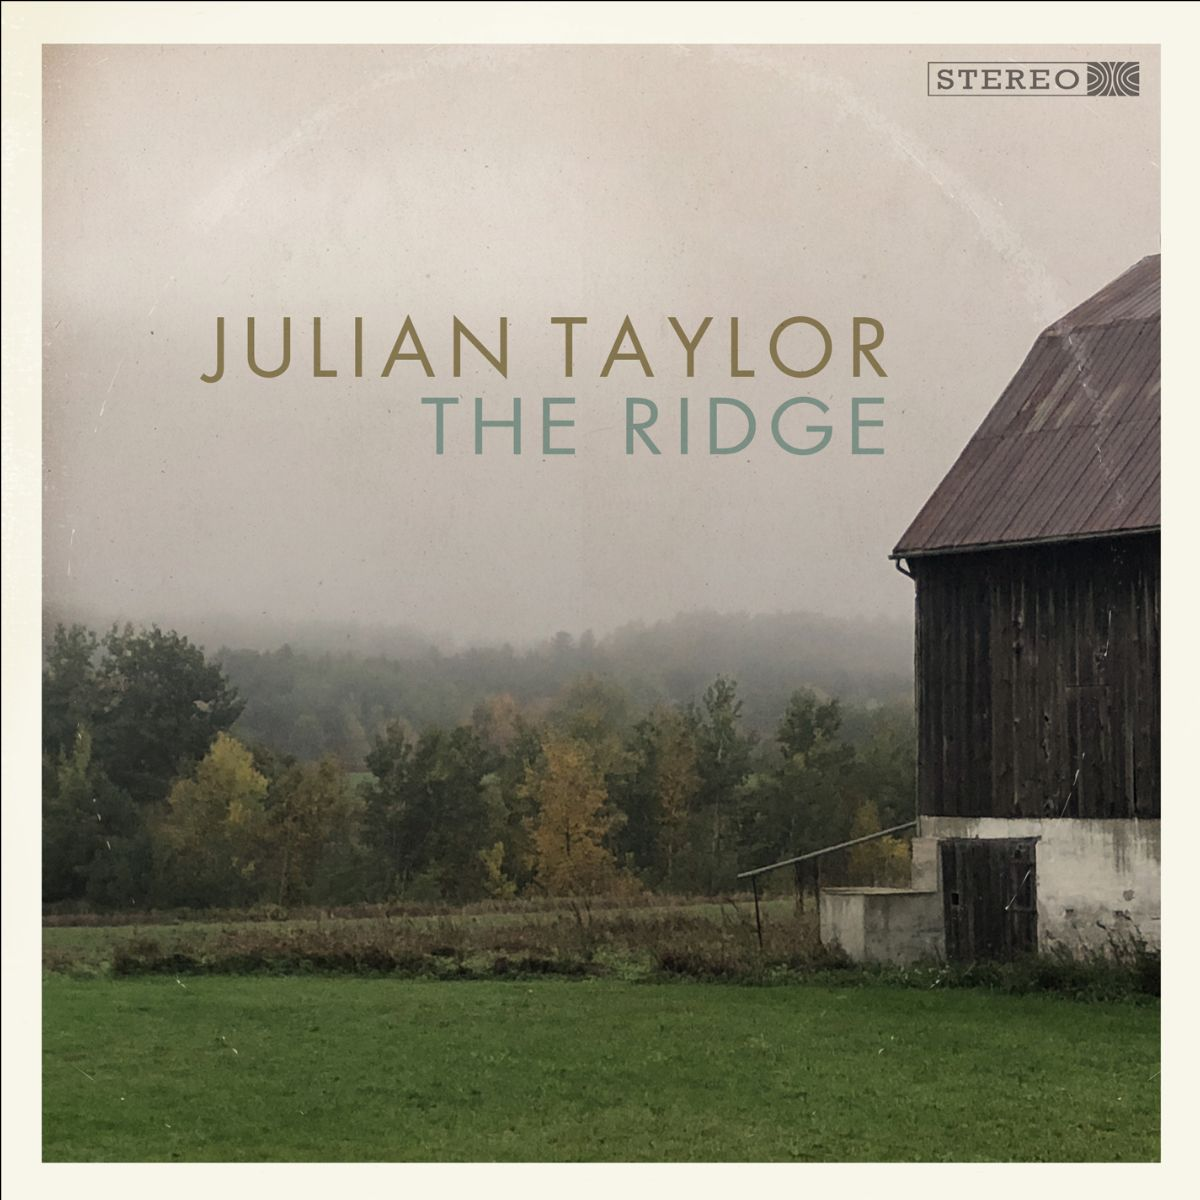 julian-taylor-the-ridge